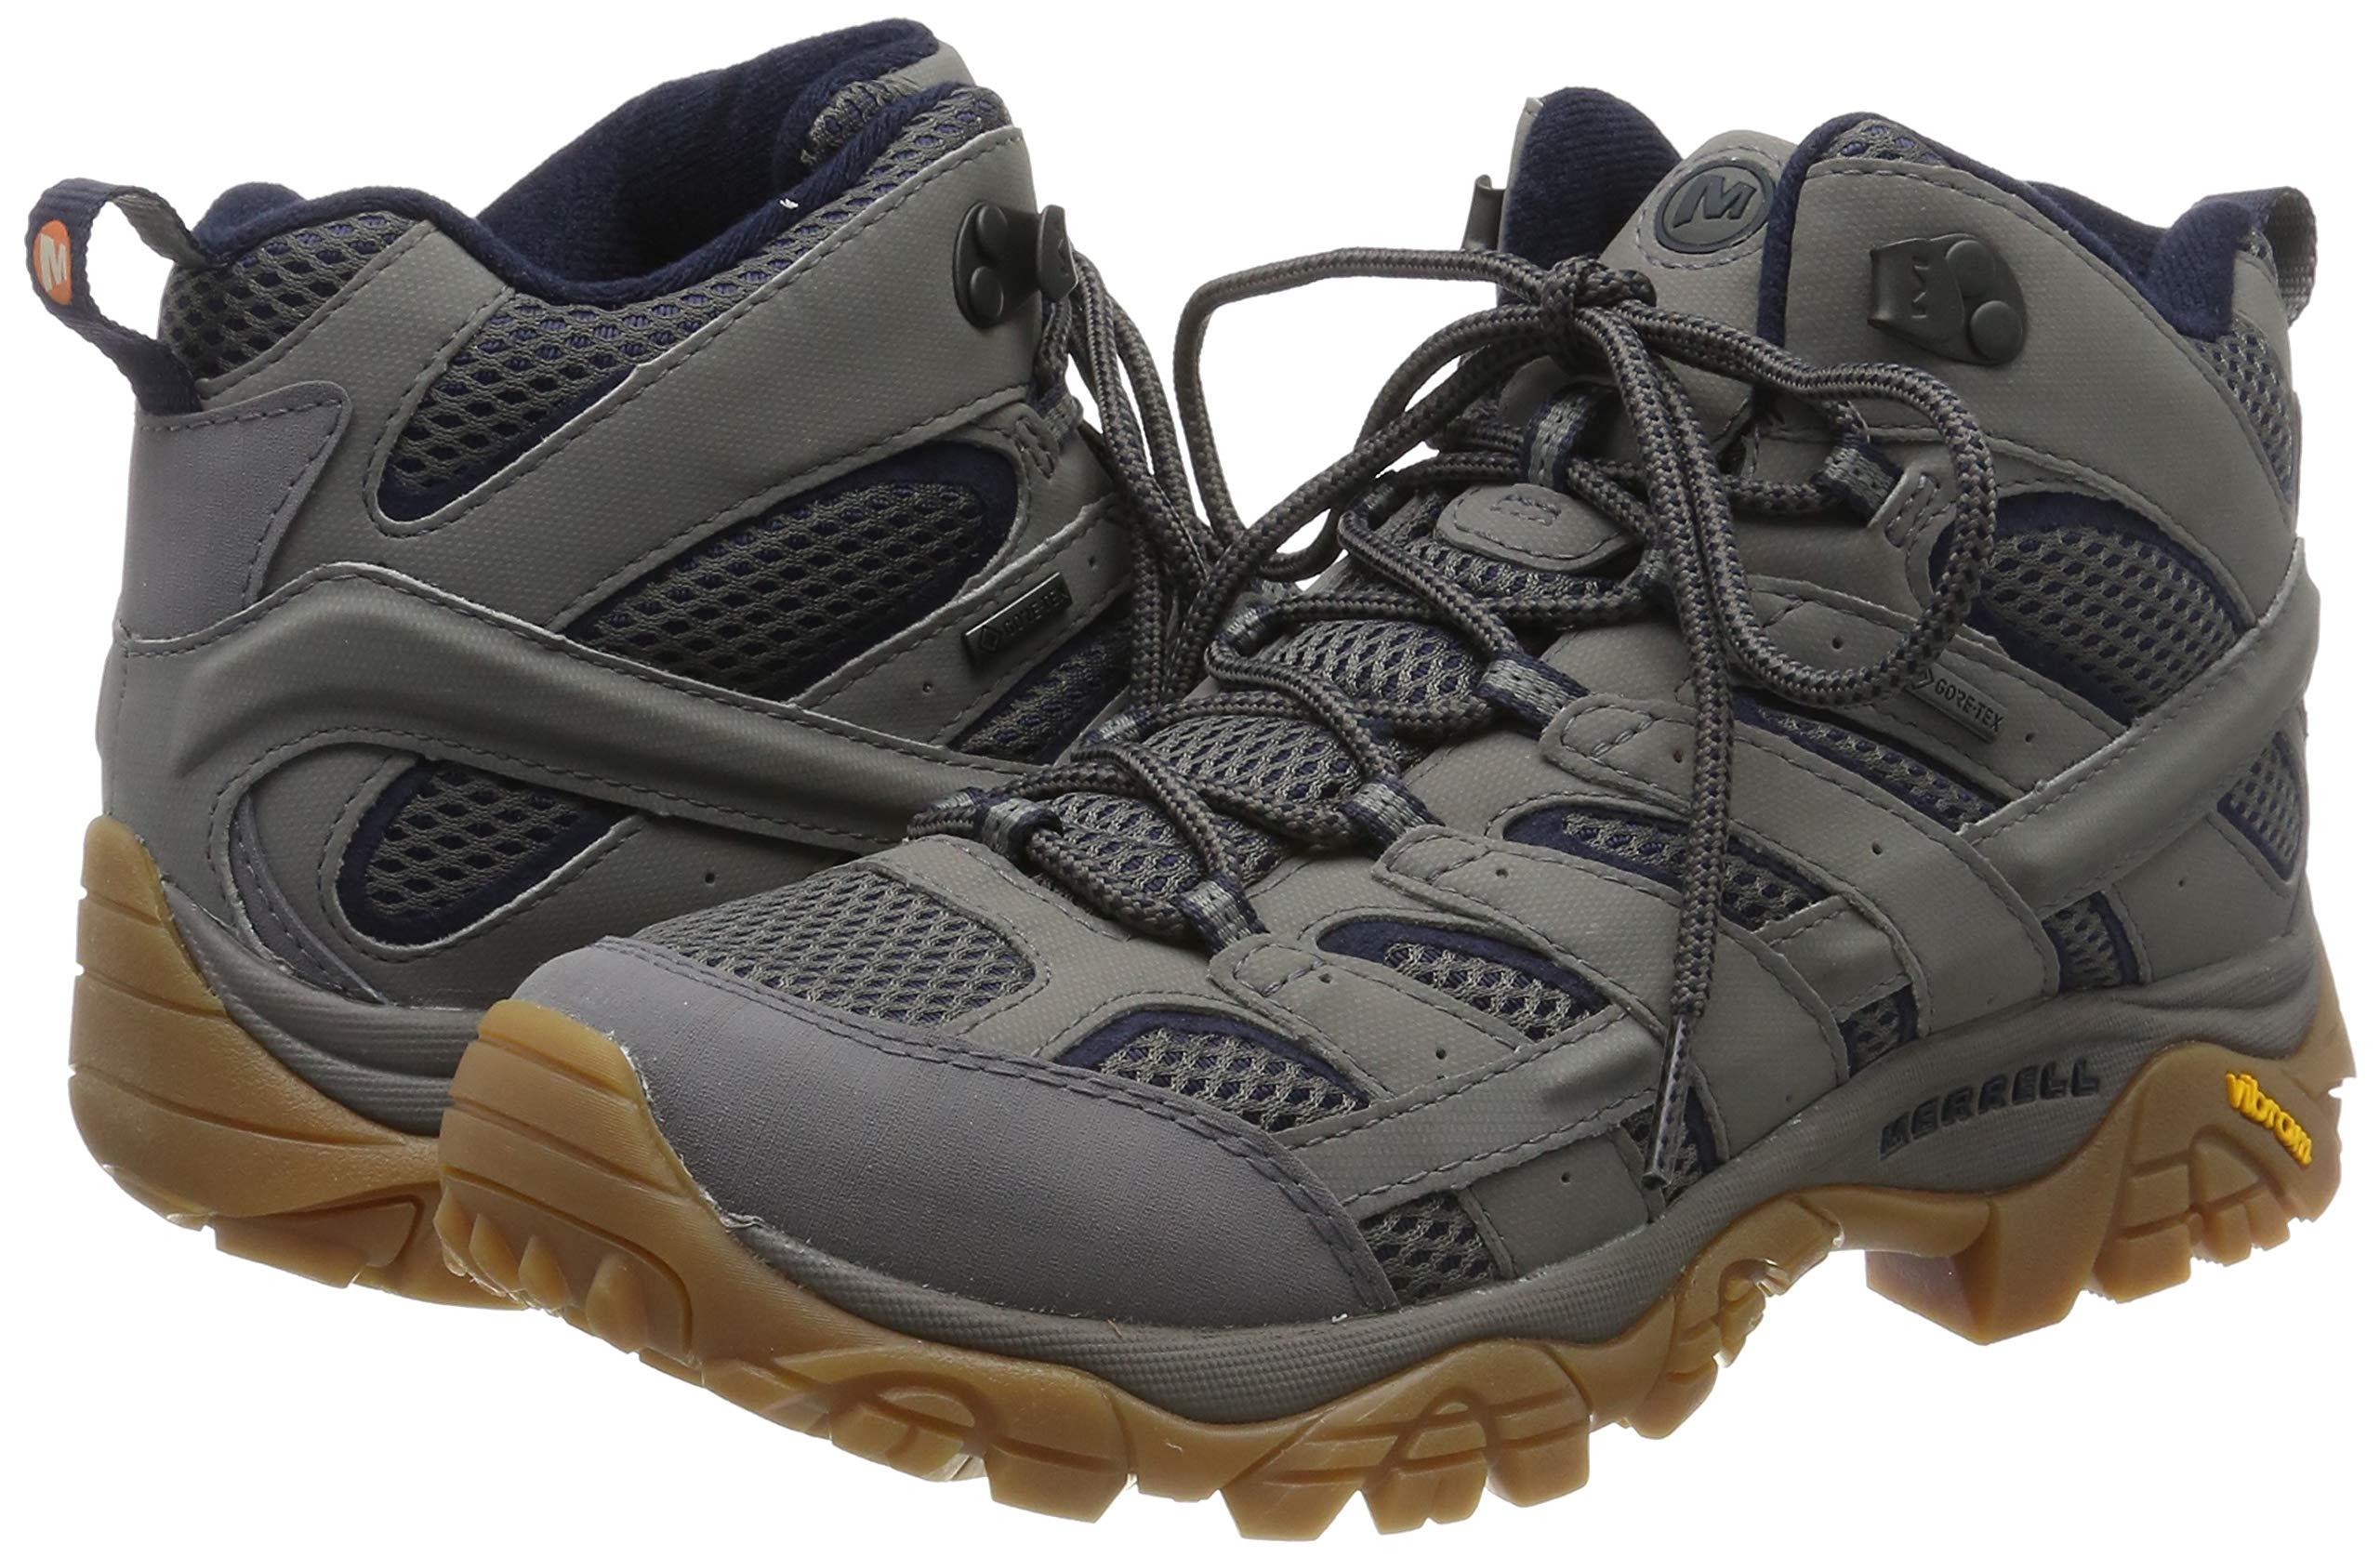 Merrell Men's Moab 2 Mid Gore-tex High Rise Hiking Shoes 5